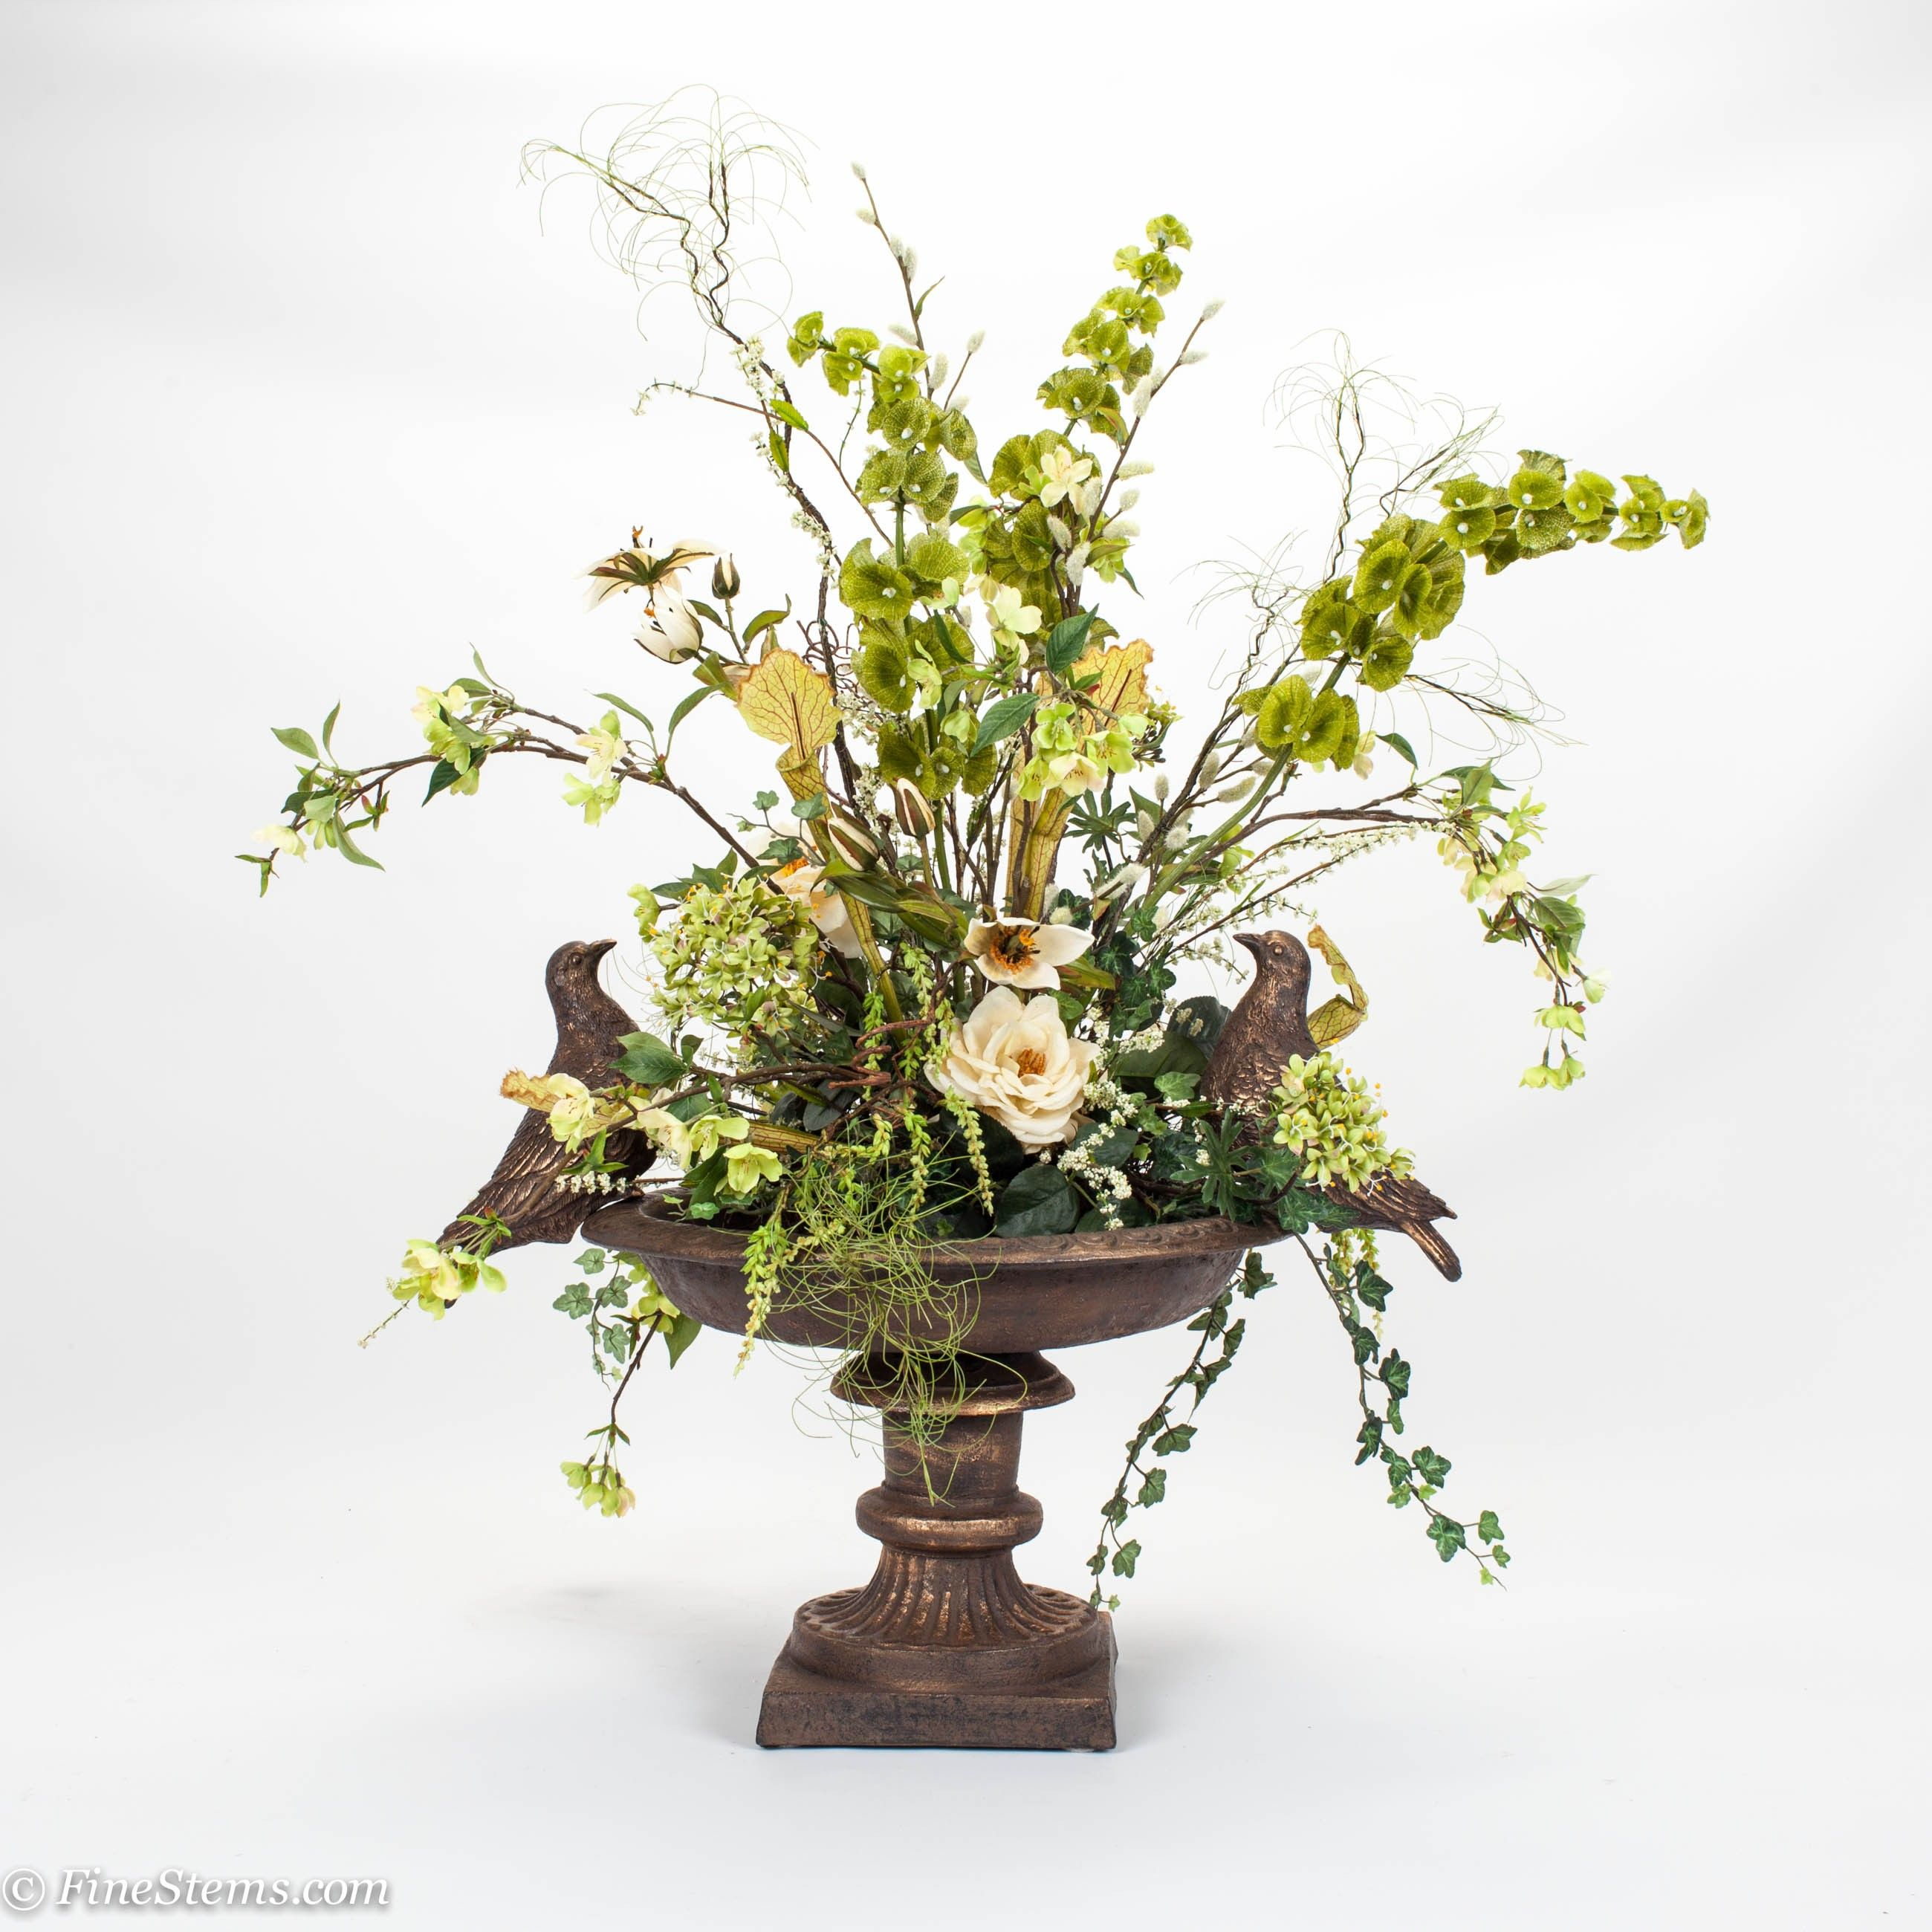 Best Faux Floral Arrangements For Home Decoration: Decorating Spring ...